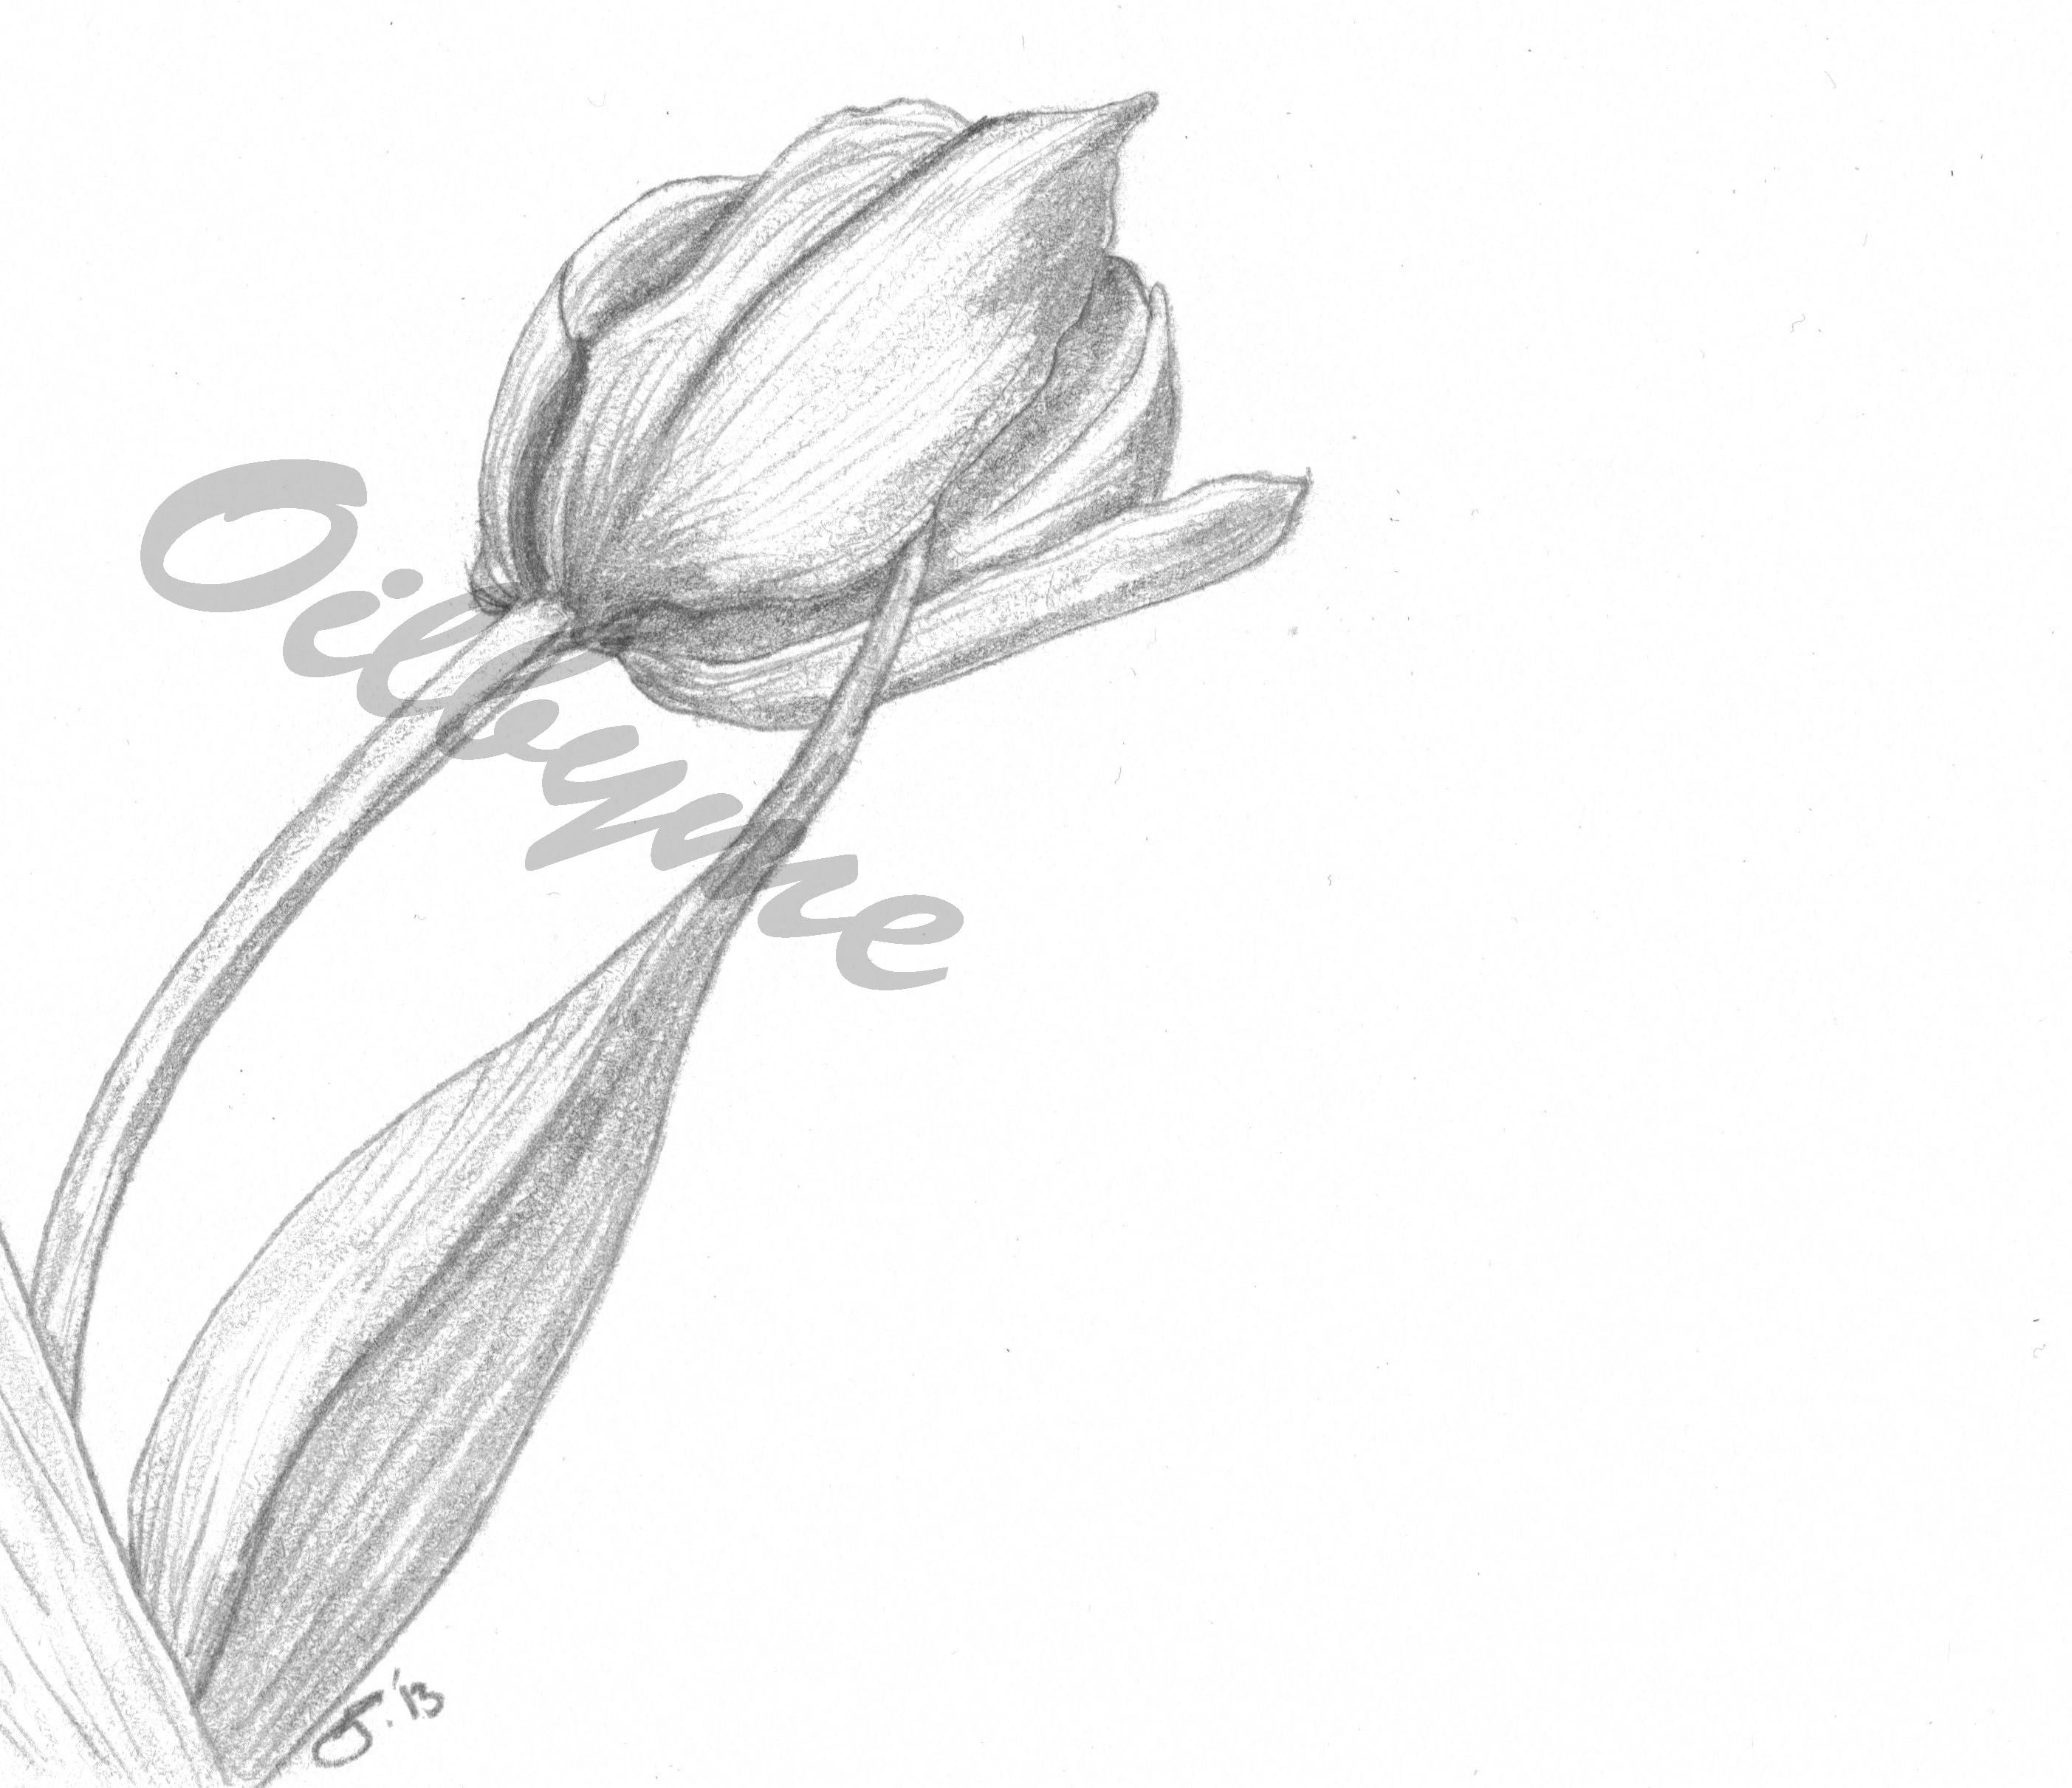 tulip sketch 6x4 sketches pinterest sketches